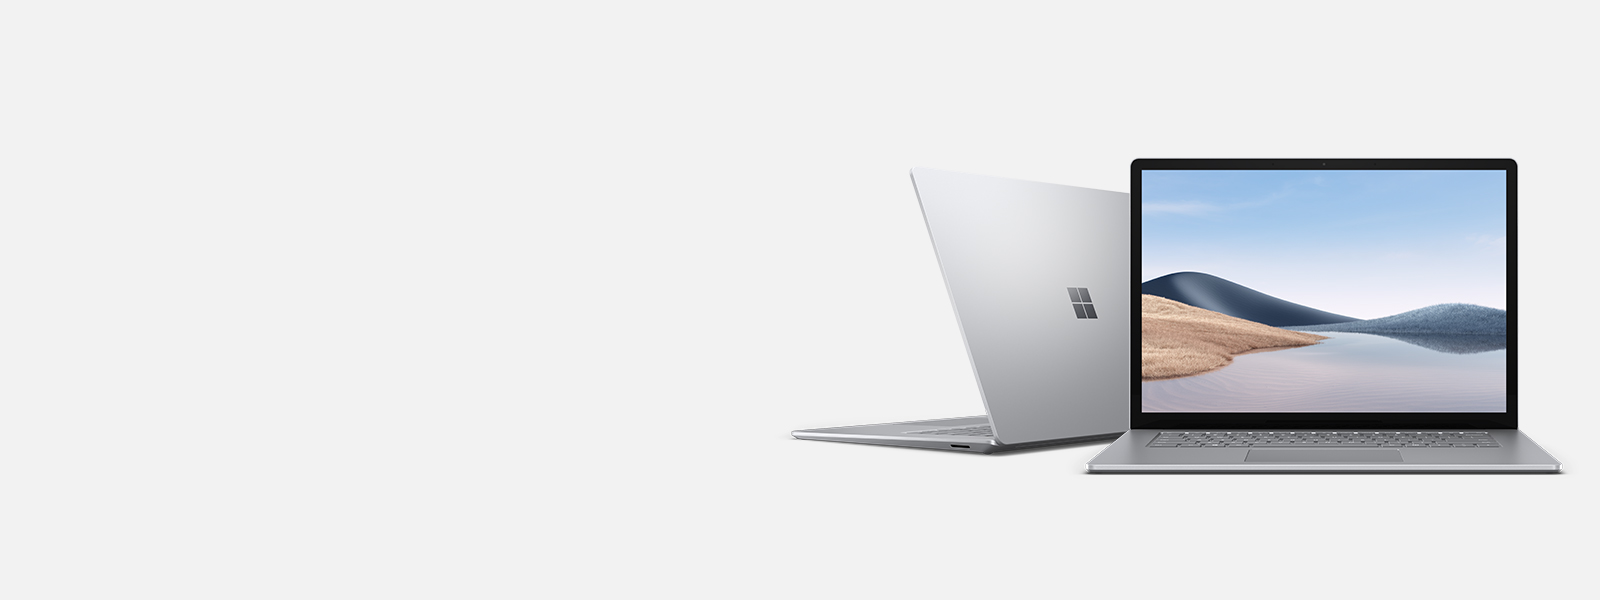 Surface Laptop 4 商用版